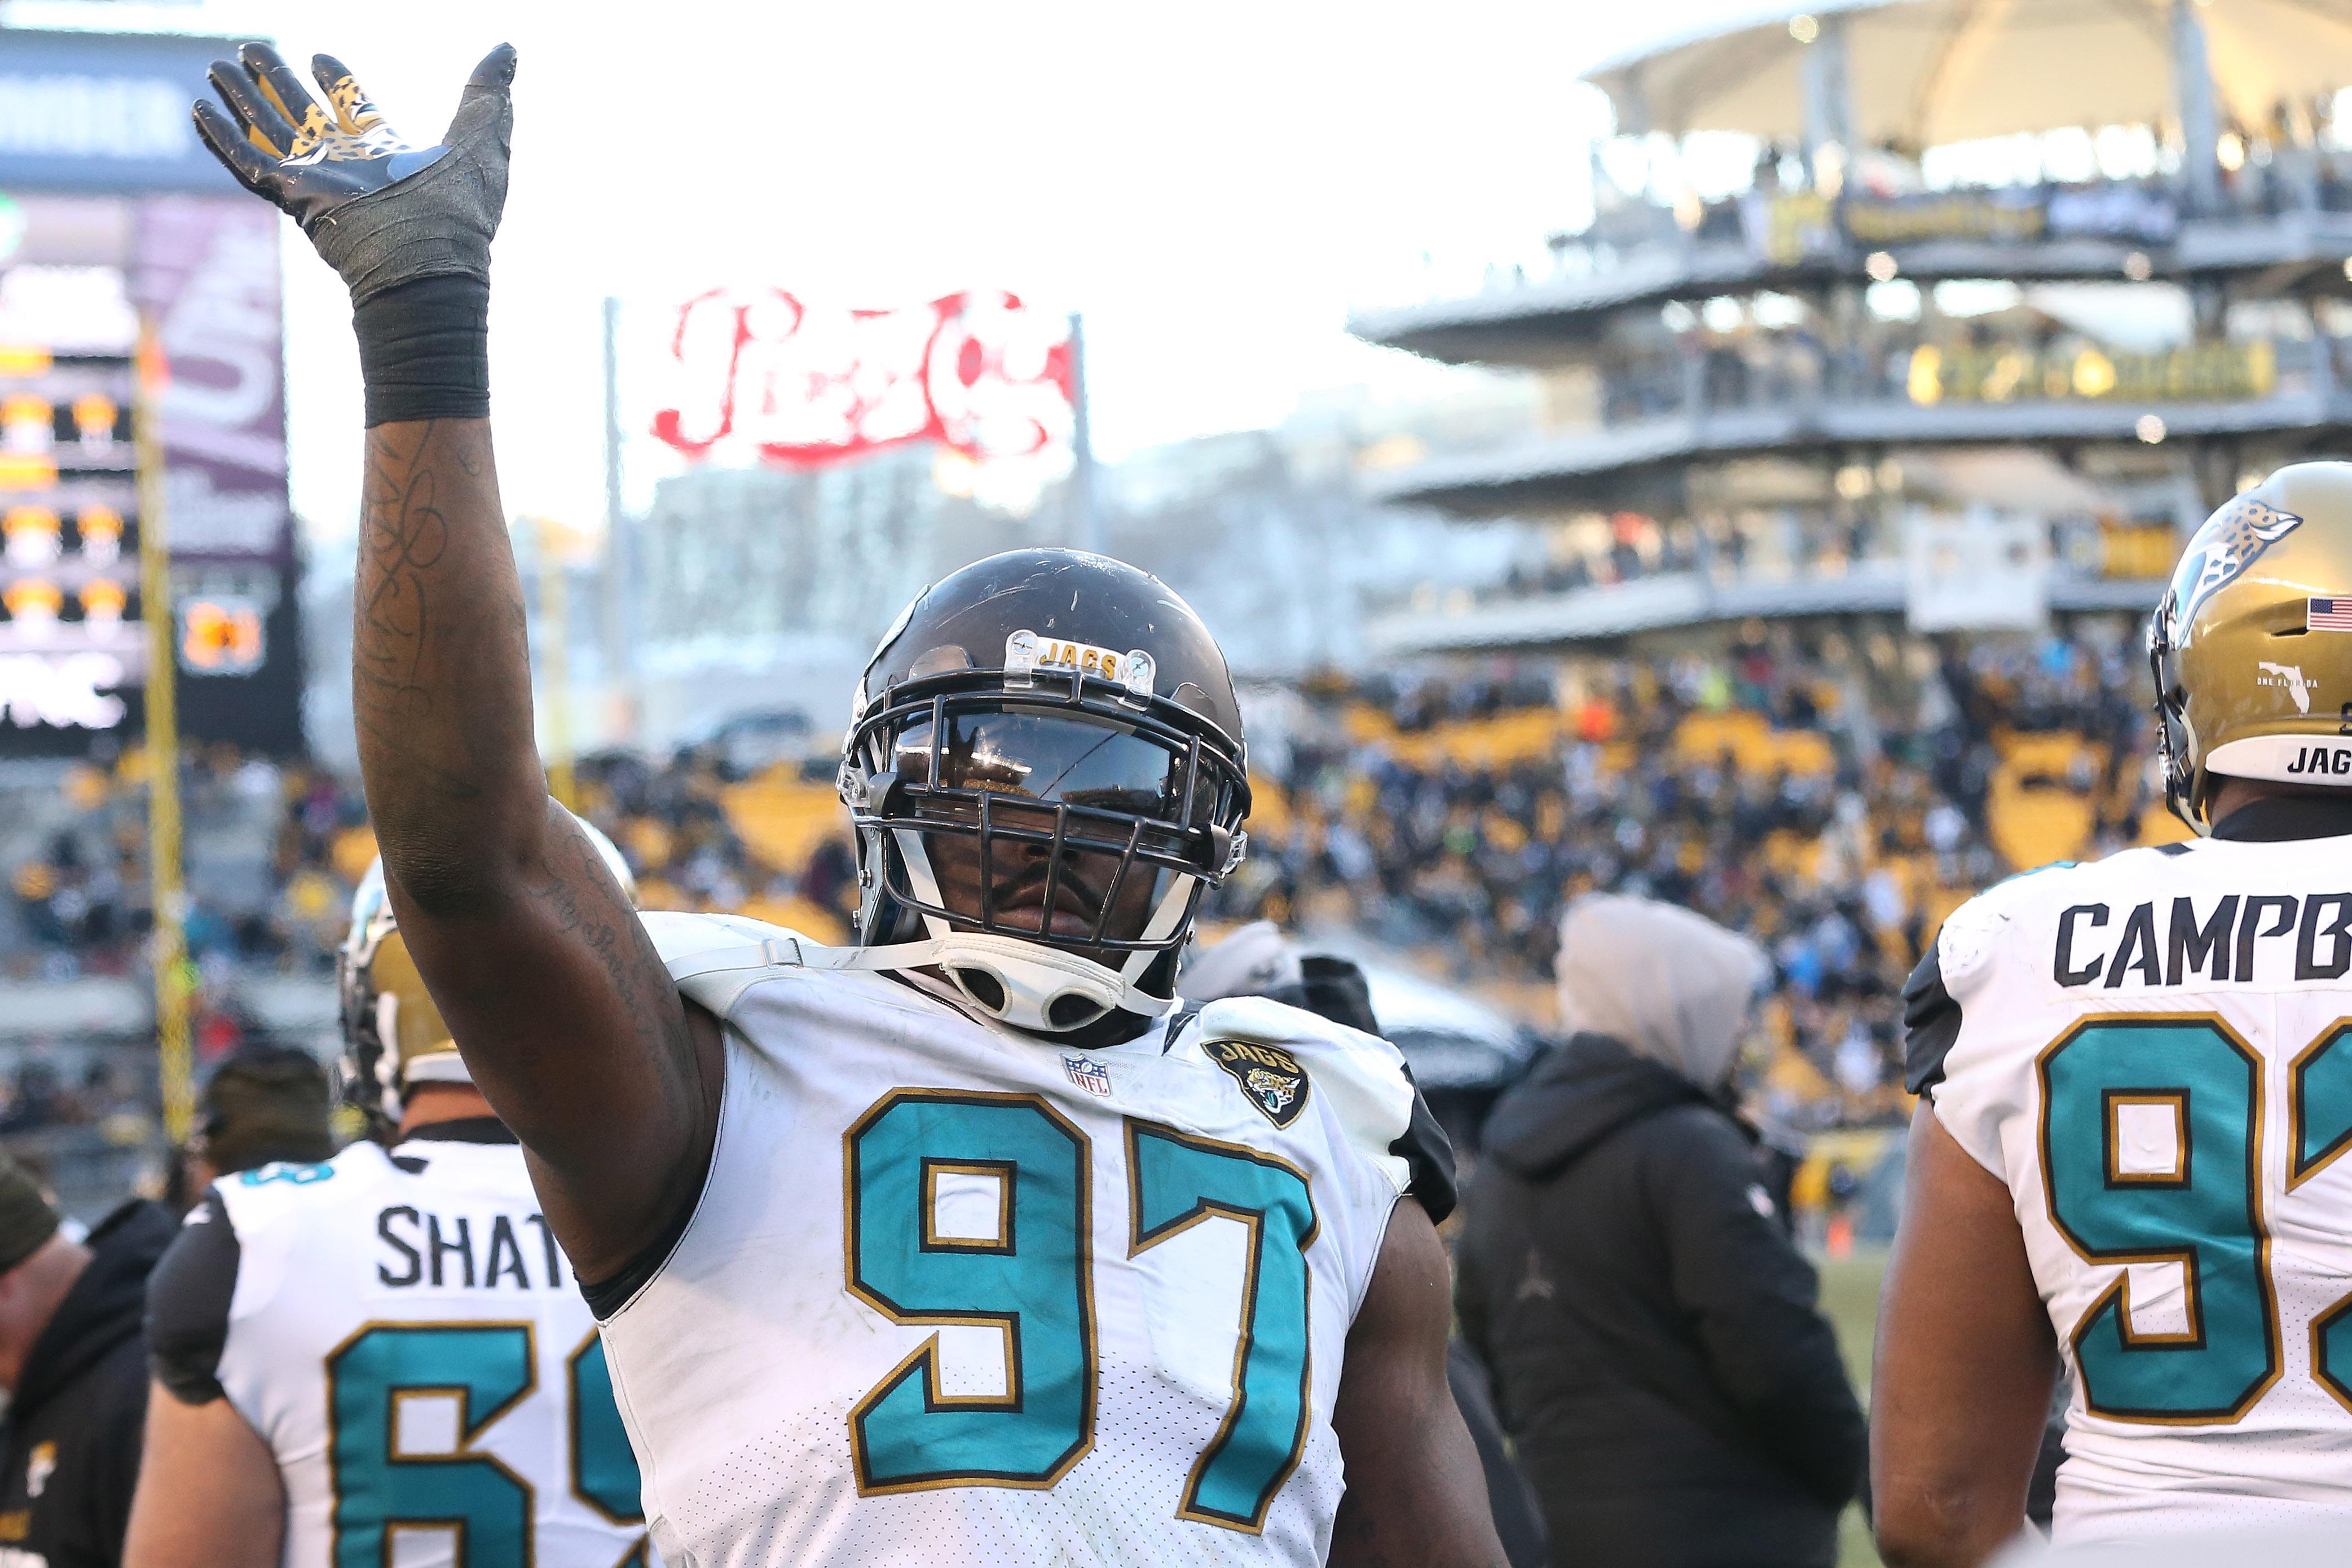 Jacksonville defensive lineman Malik Jackson waves to Pittsburgh fans after Jacksonville's win